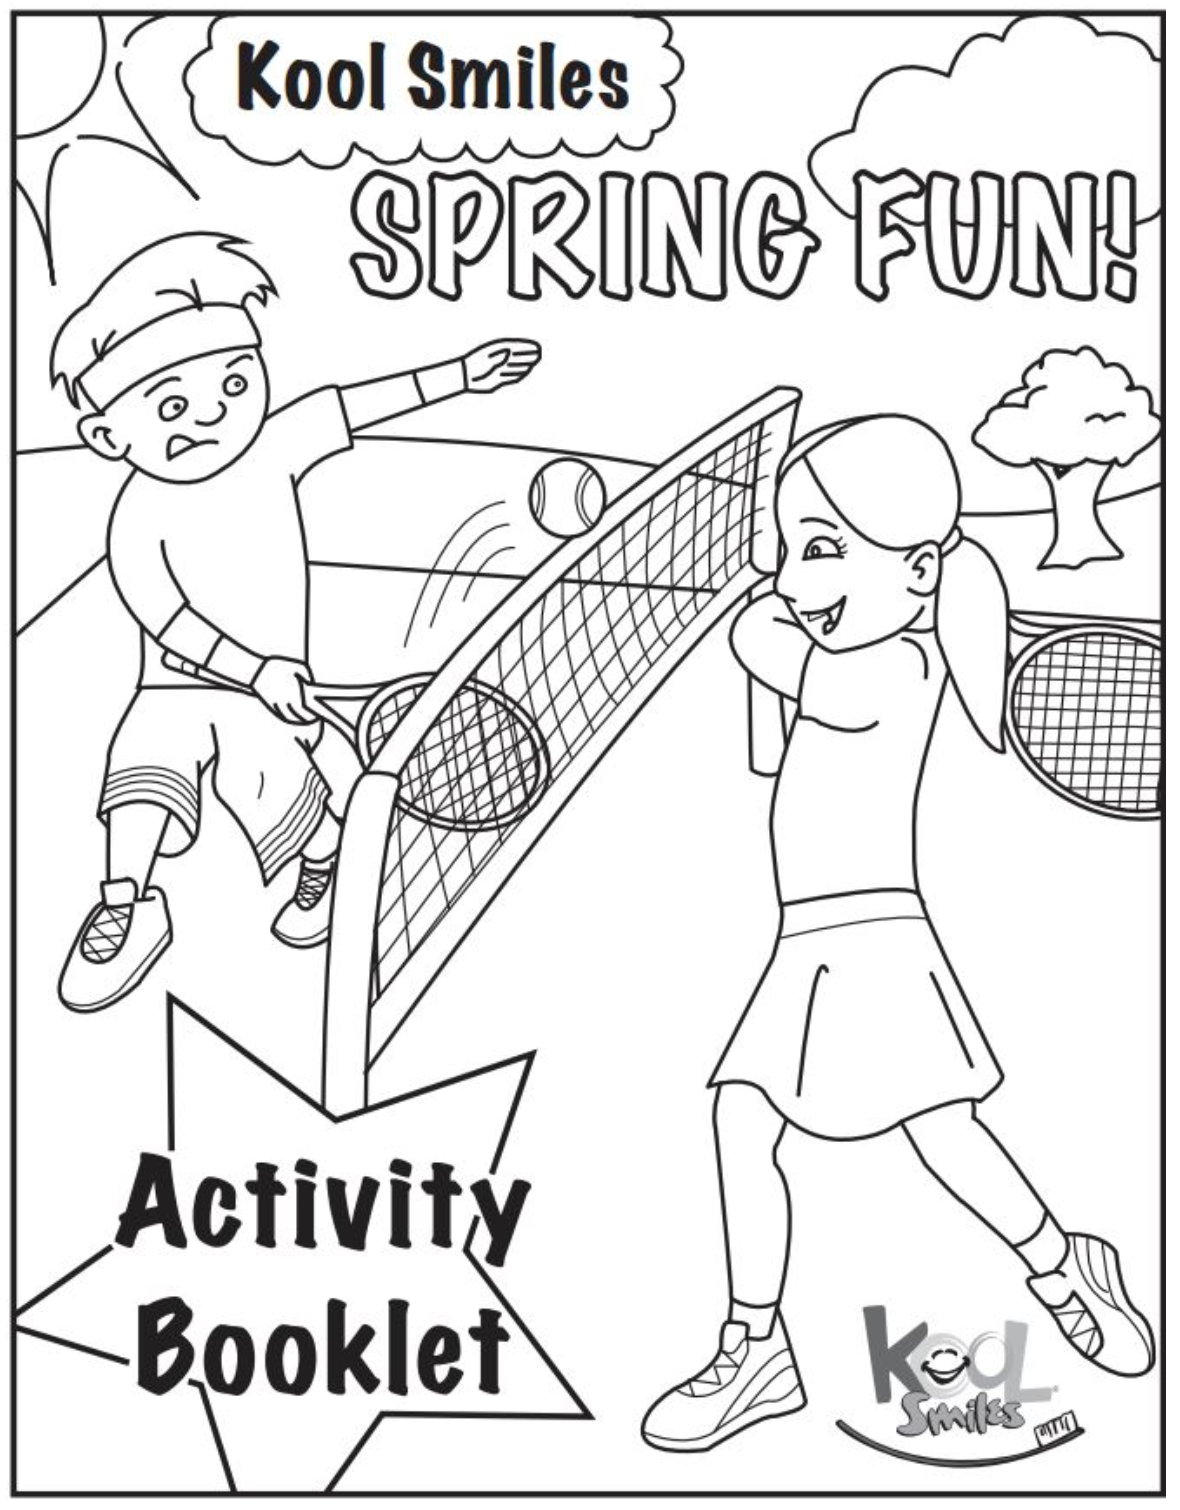 Spring Break Activity Booklet